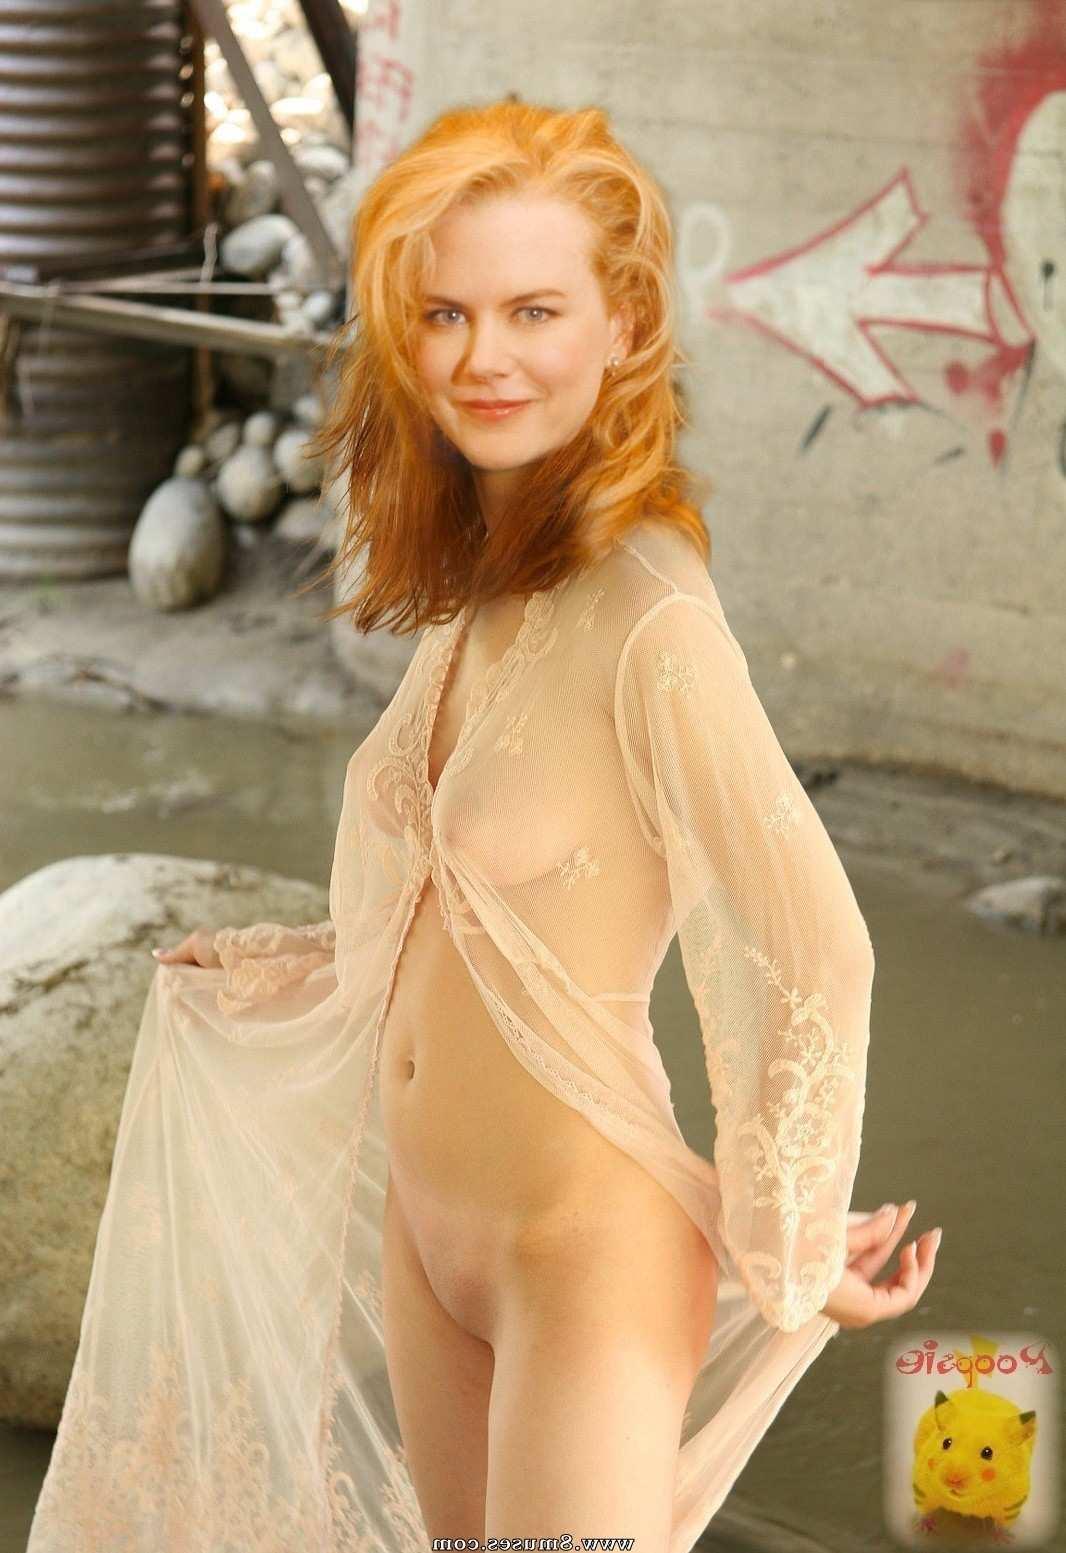 Fake-Celebrities-Sex-Pictures/Nicole-Kidman Nicole_Kidman__8muses_-_Sex_and_Porn_Comics_632.jpg